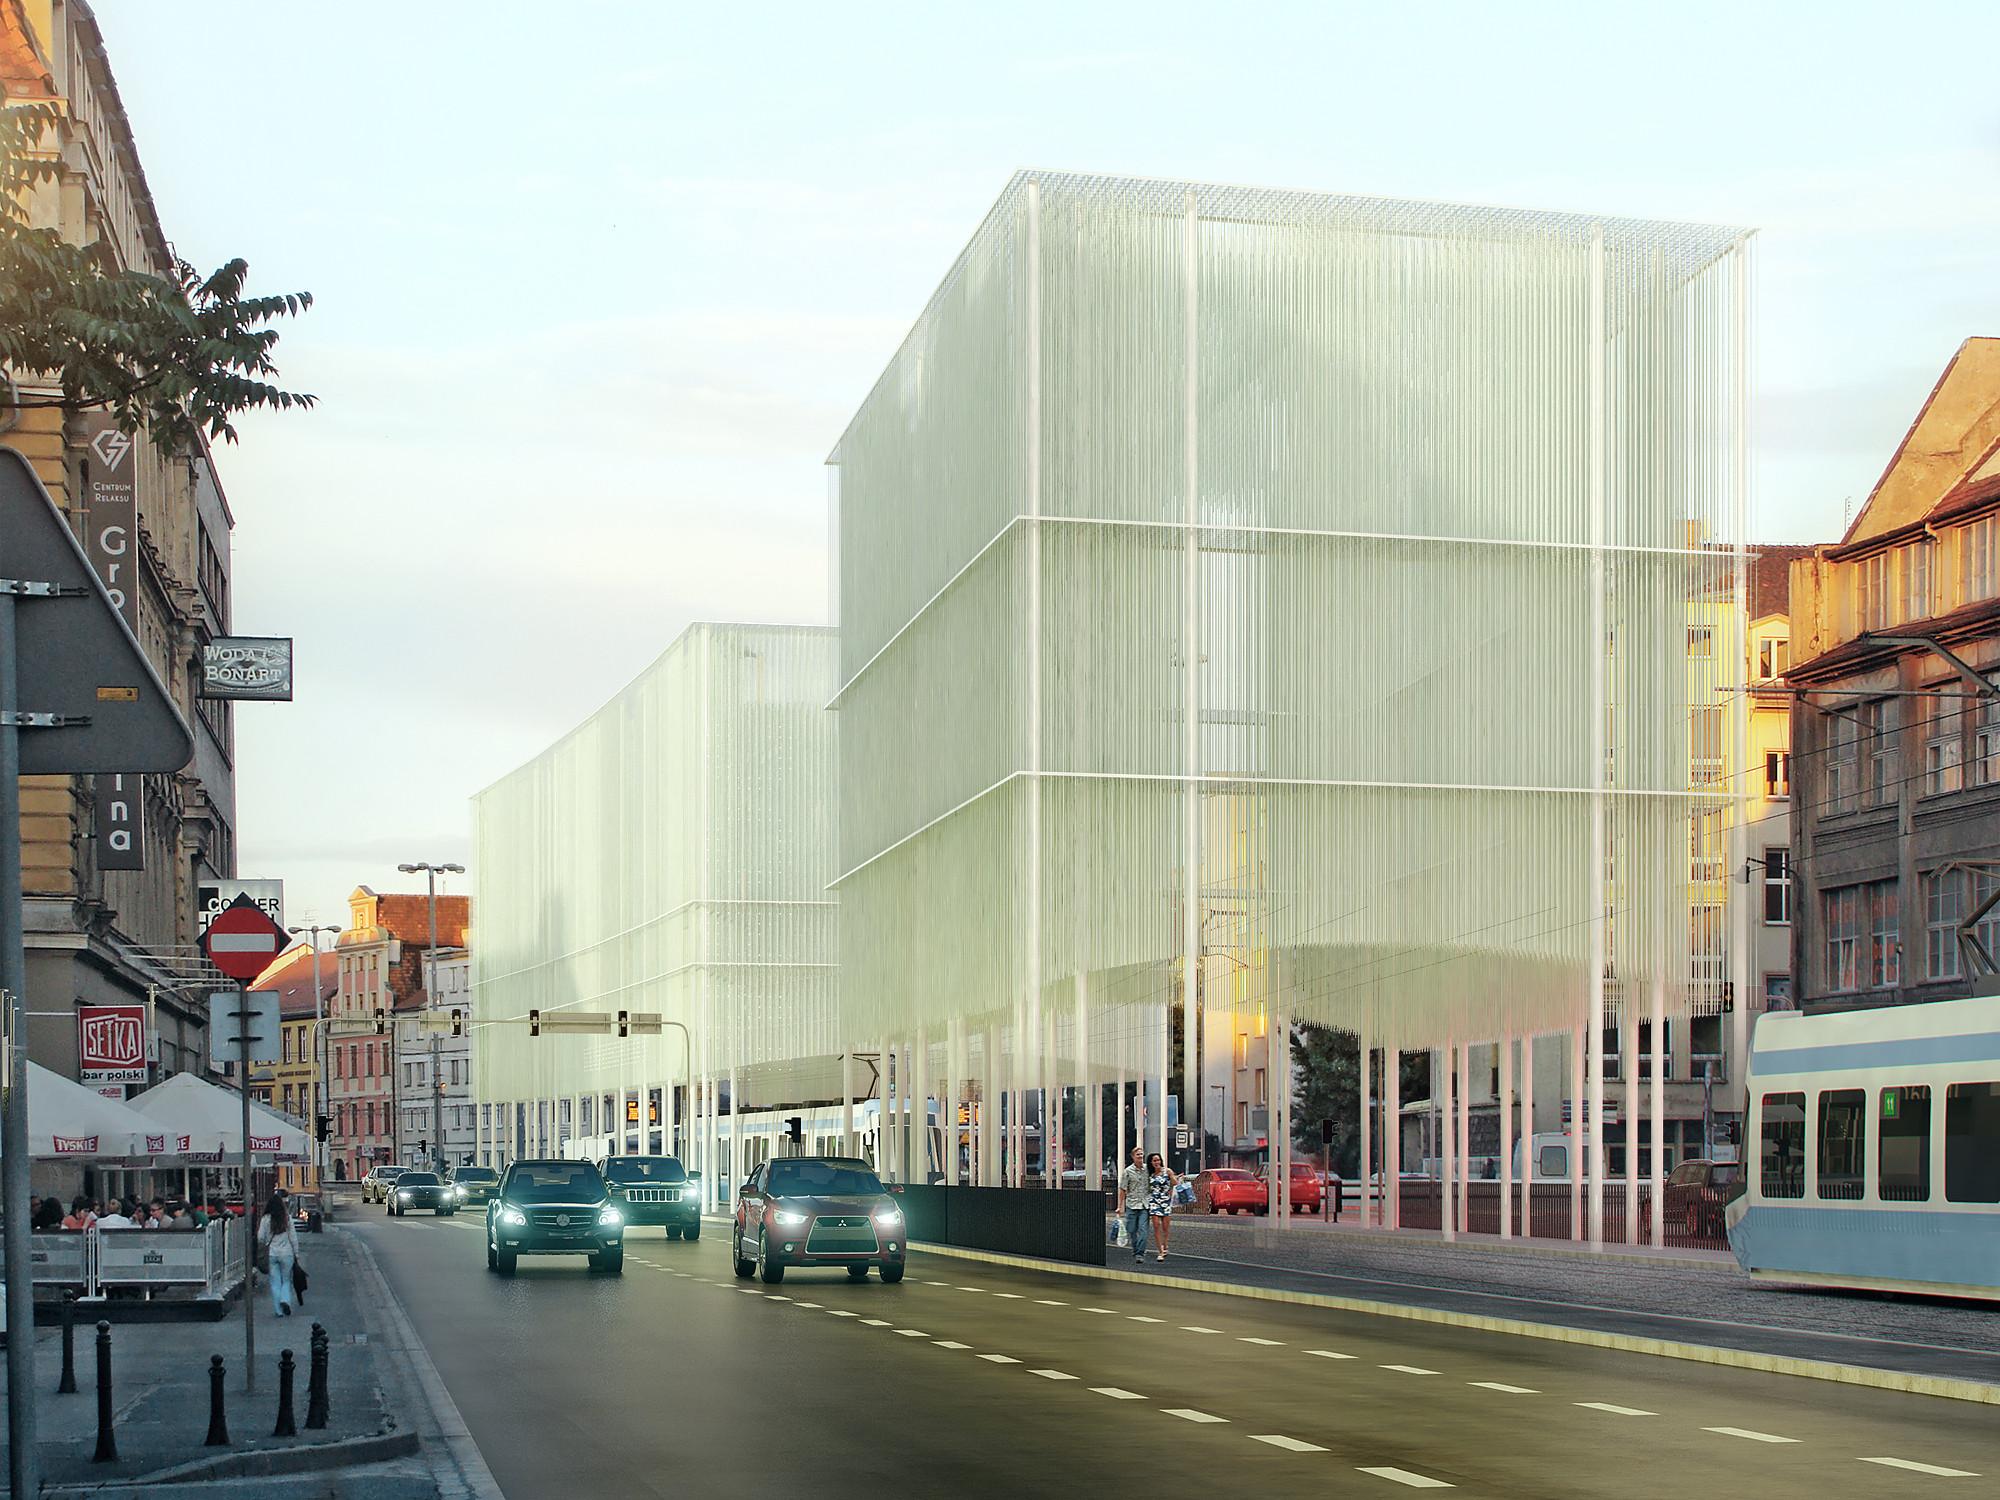 Świdnicka Underground Crossing Winning Proposal / Major Architekci, Courtesy of Major Architekci